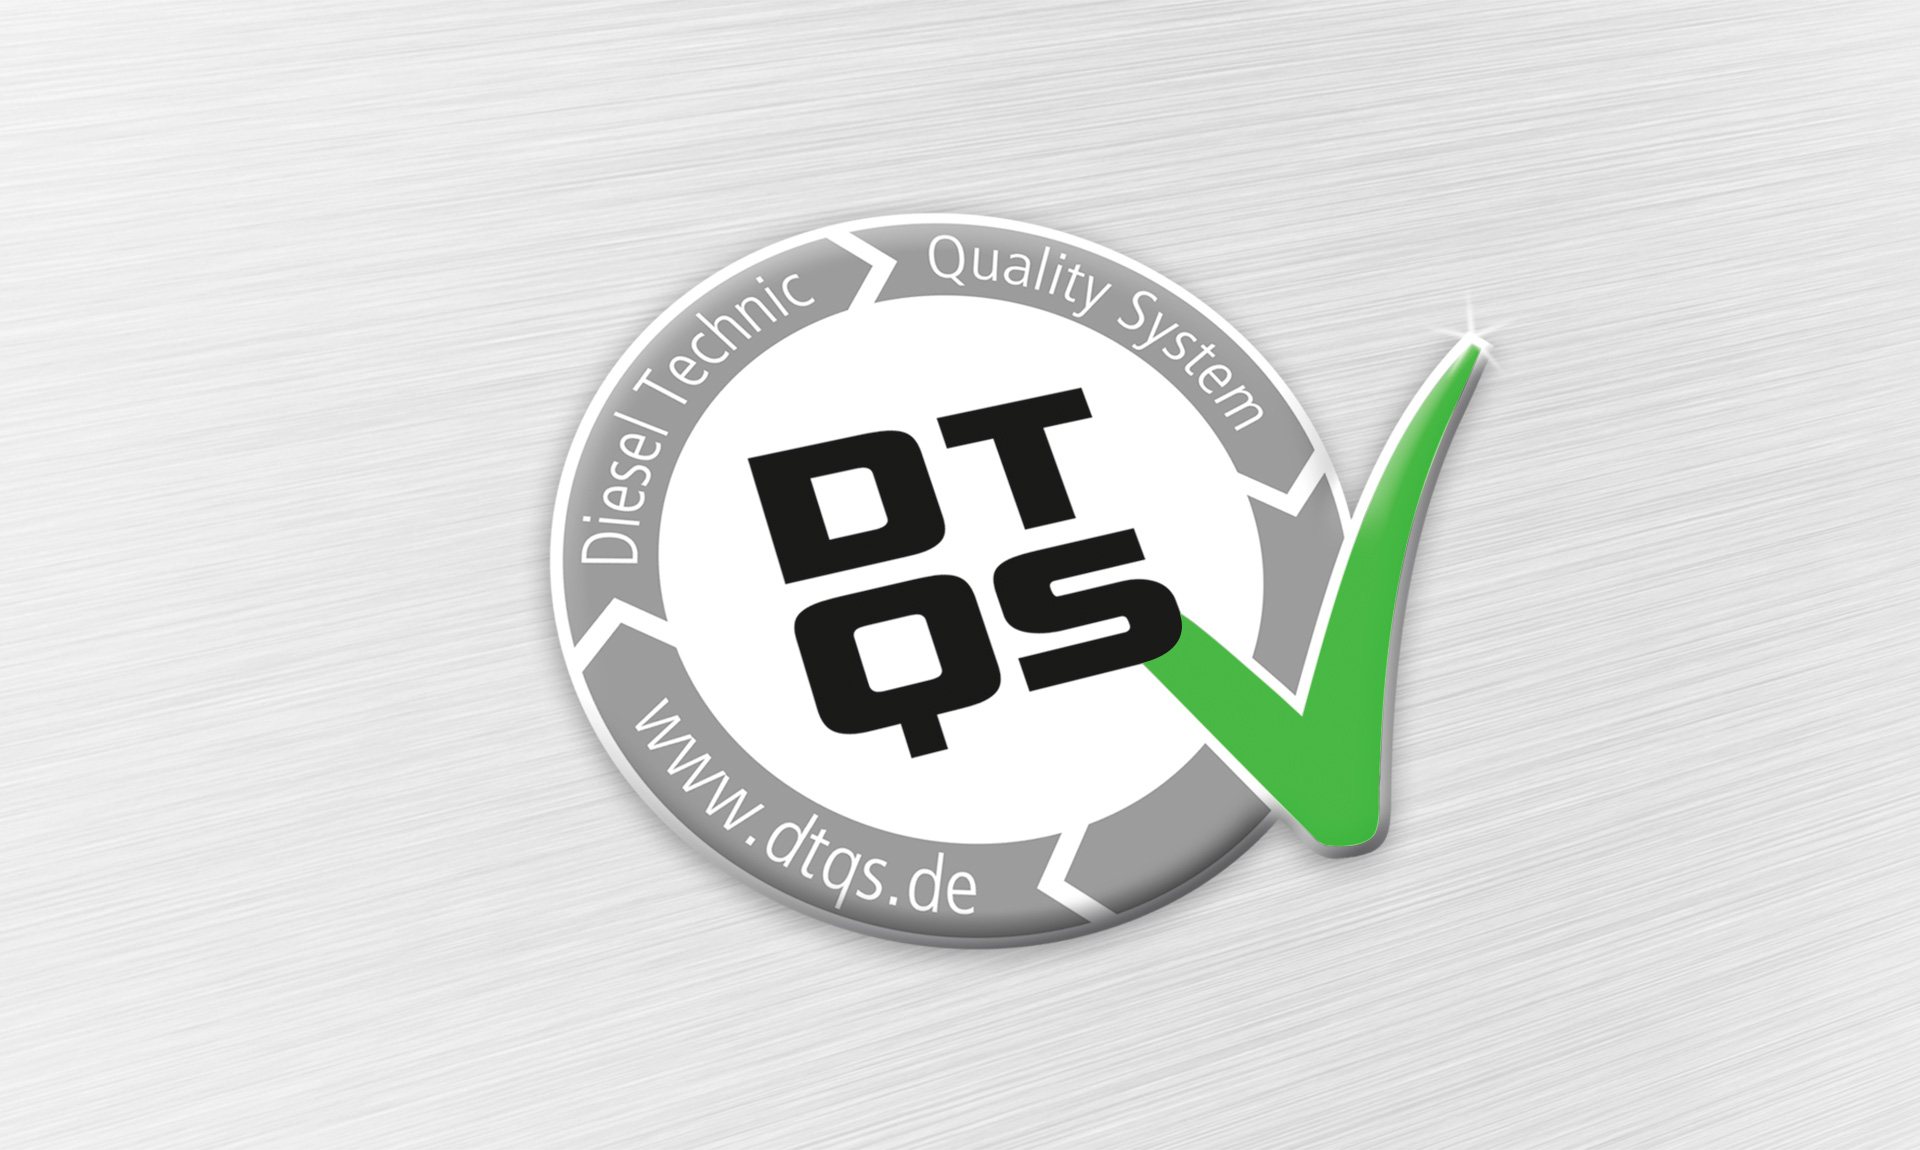 Diesel Technic Quality System